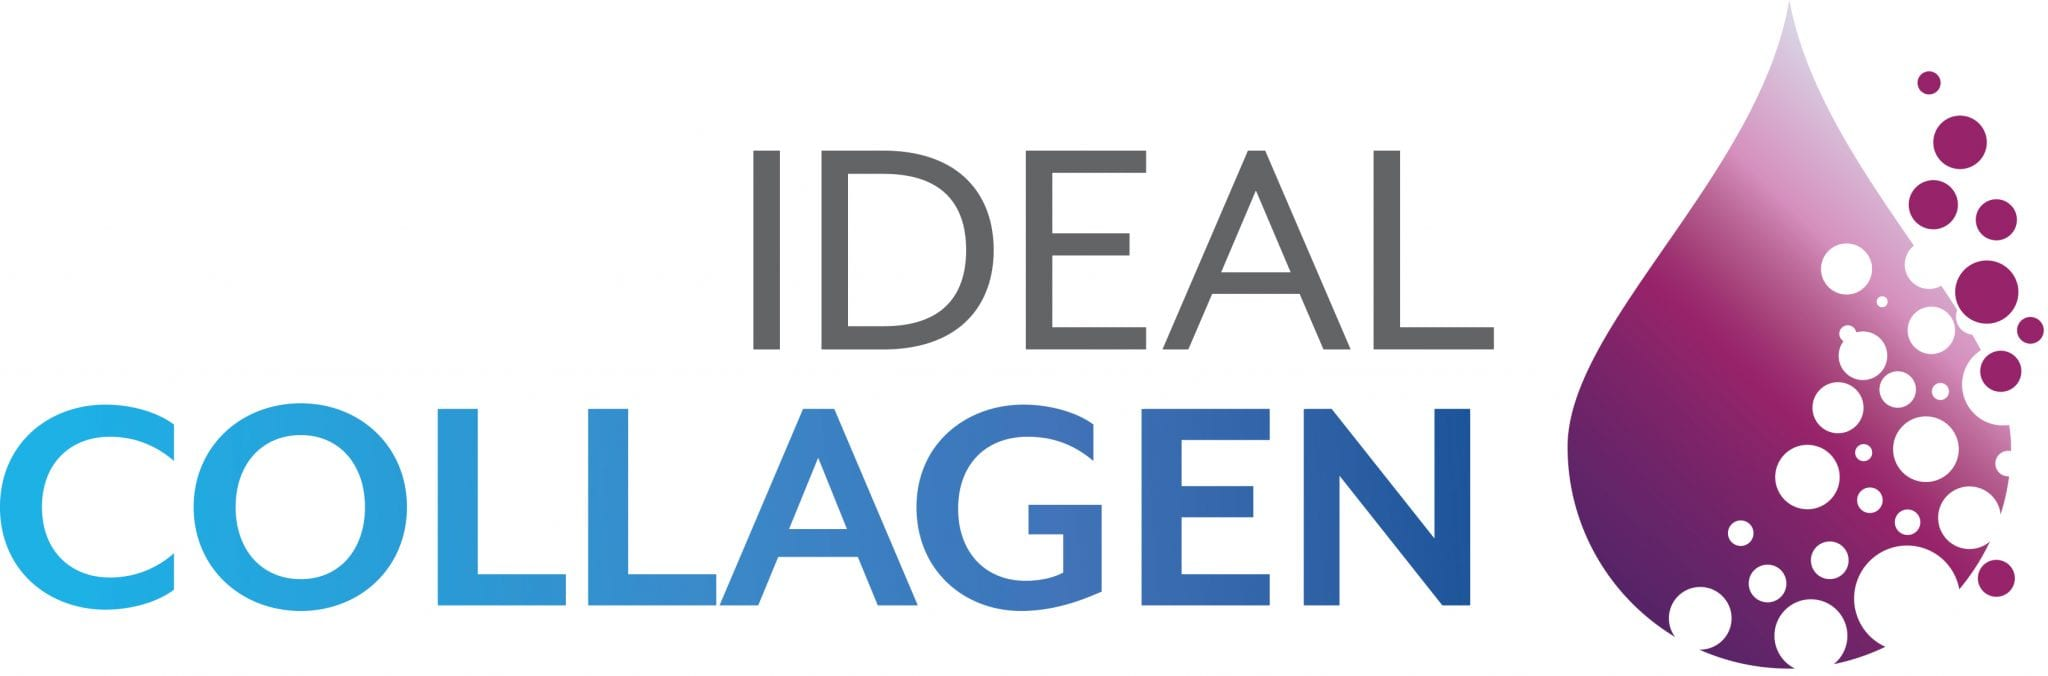 Ideal Collagen #1 Hydrolyzed Collagen Formula